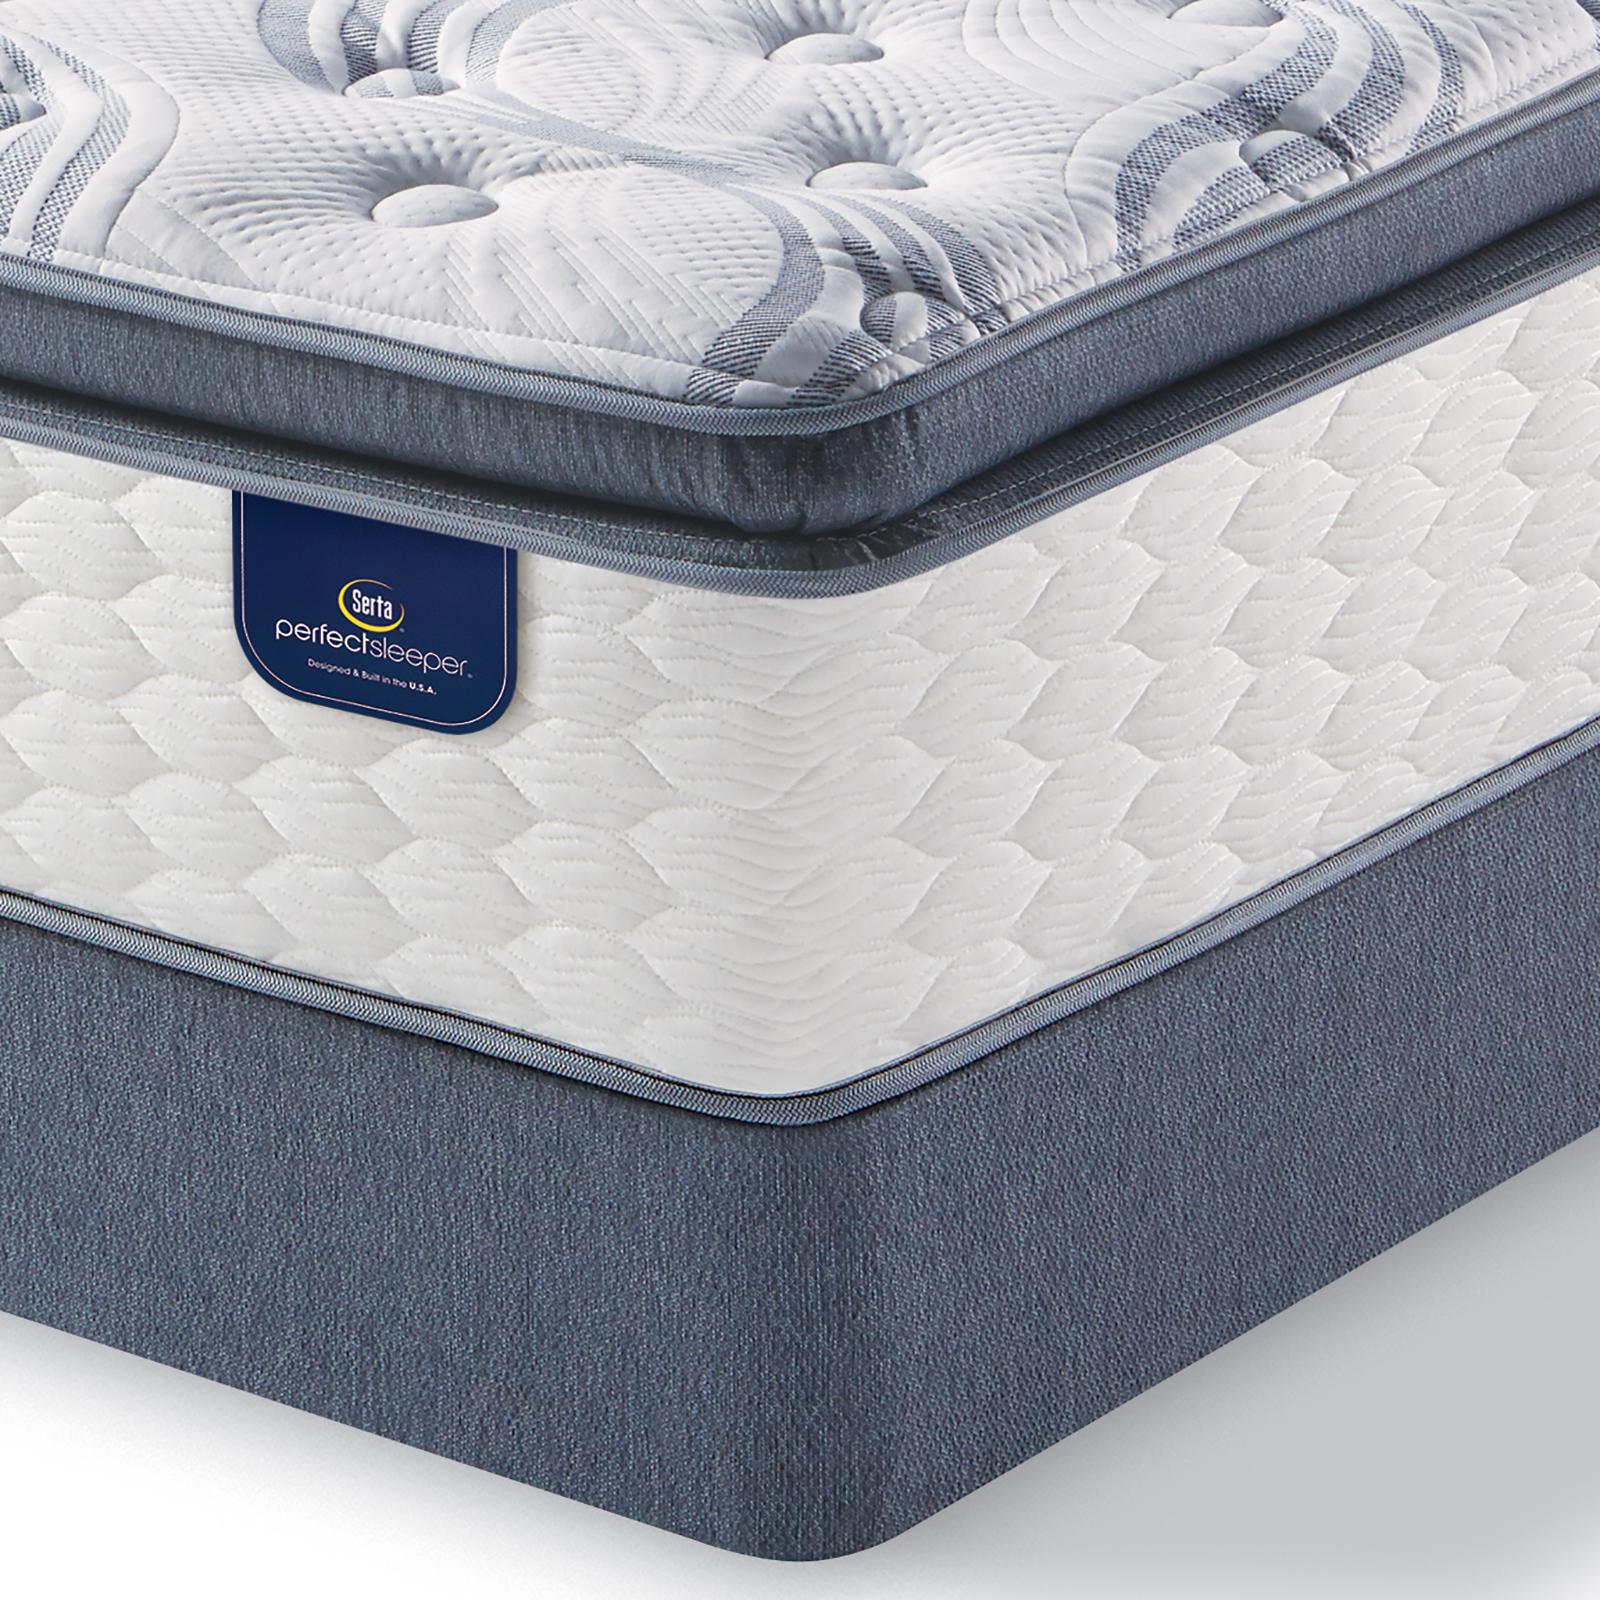 Serta Perfect Sleeper Teddington Plush King Mattress